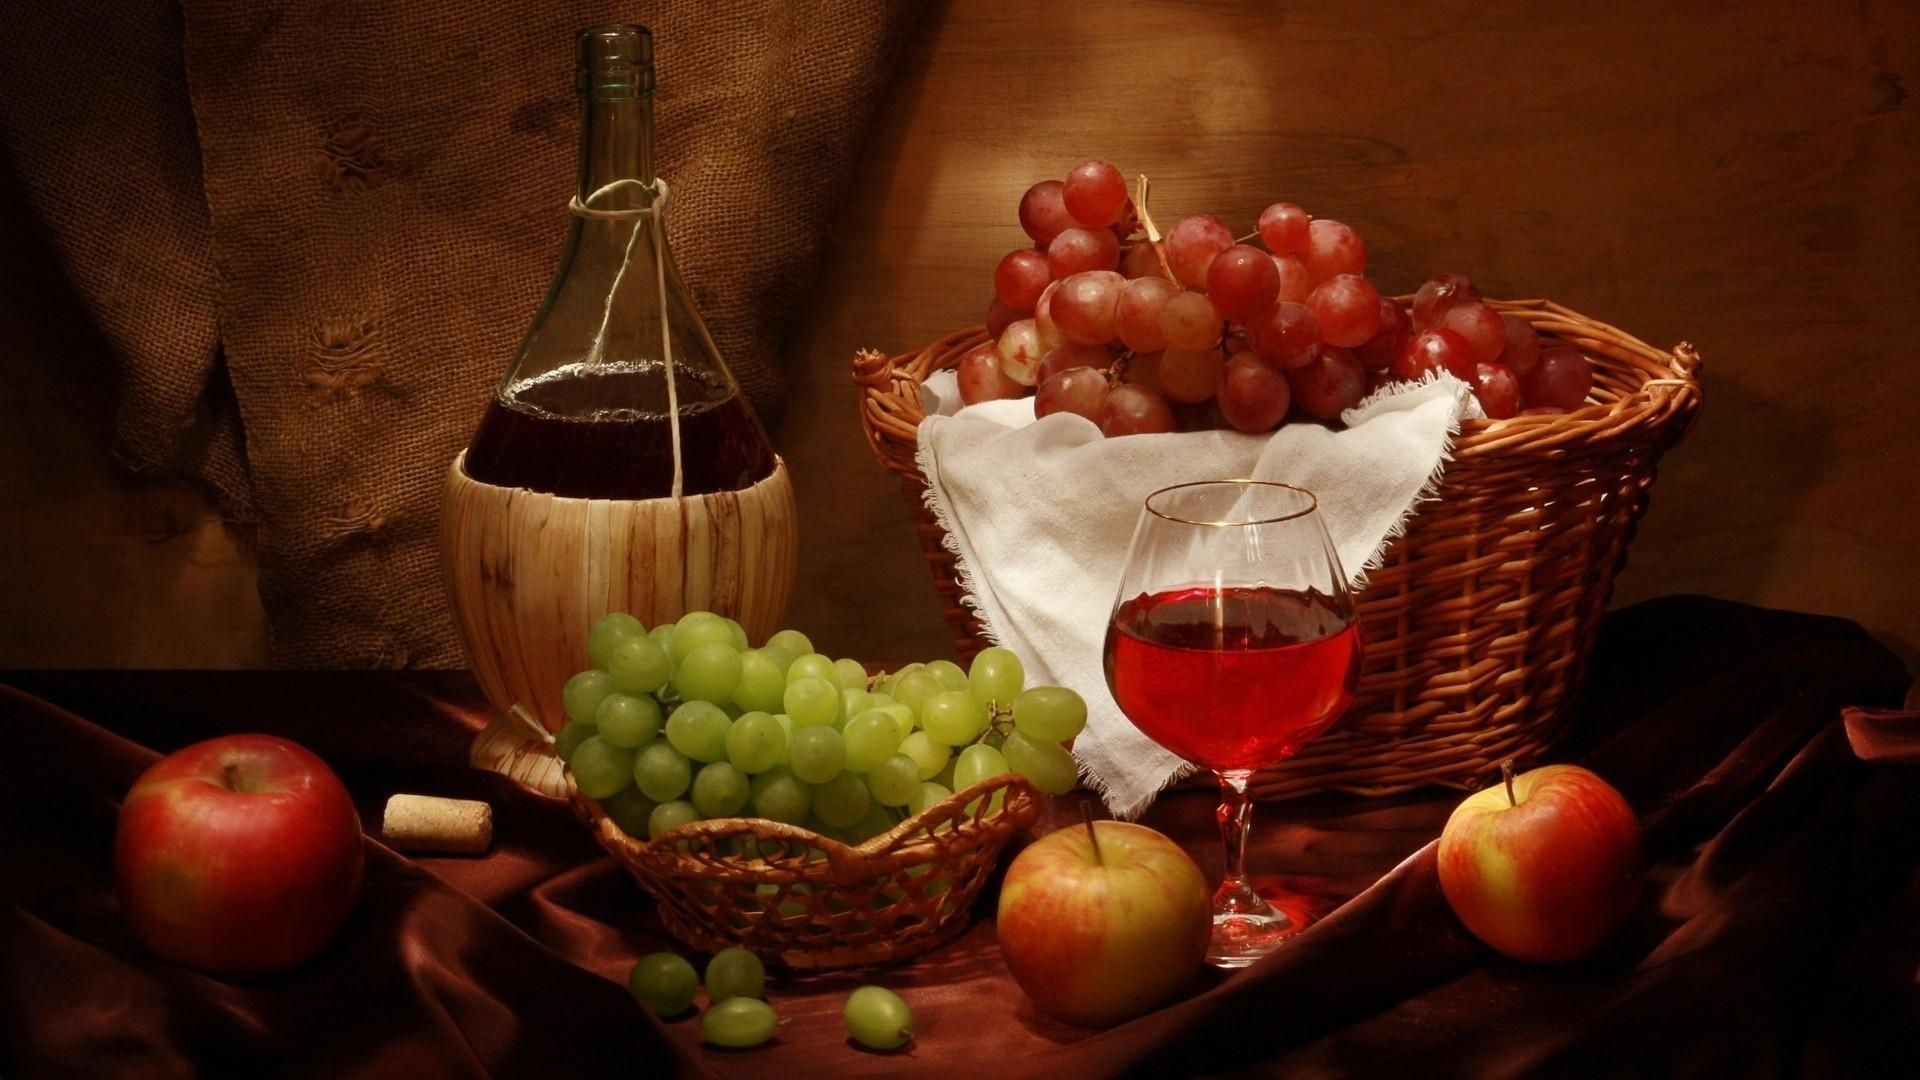 Food Desktop Wallpaper 1920x1080 Food Desktop Grapes Wine Apples 1920x1080